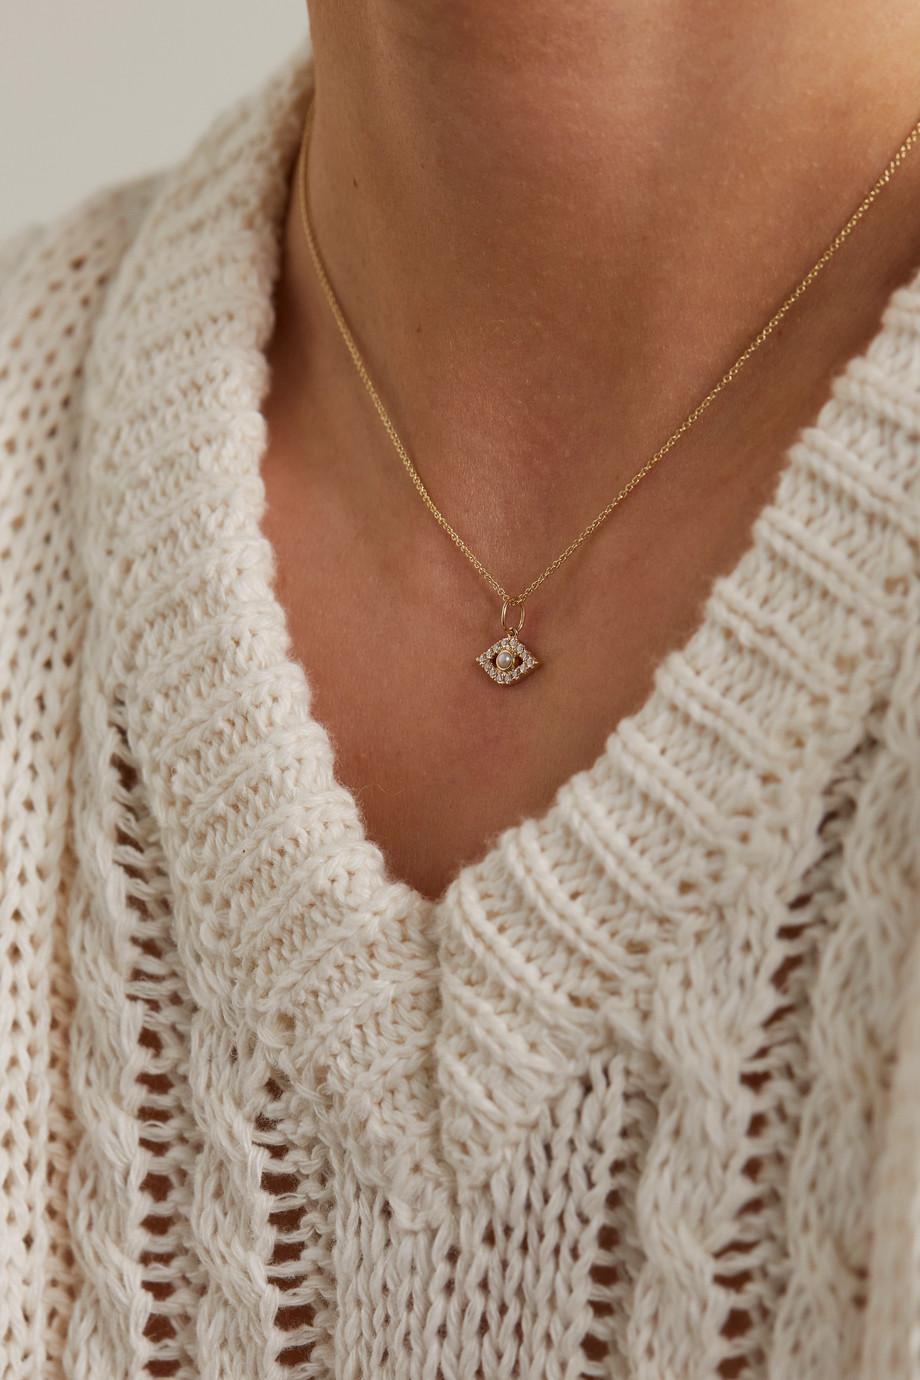 Sydney Evan 14-karat gold, pearl and diamond necklace